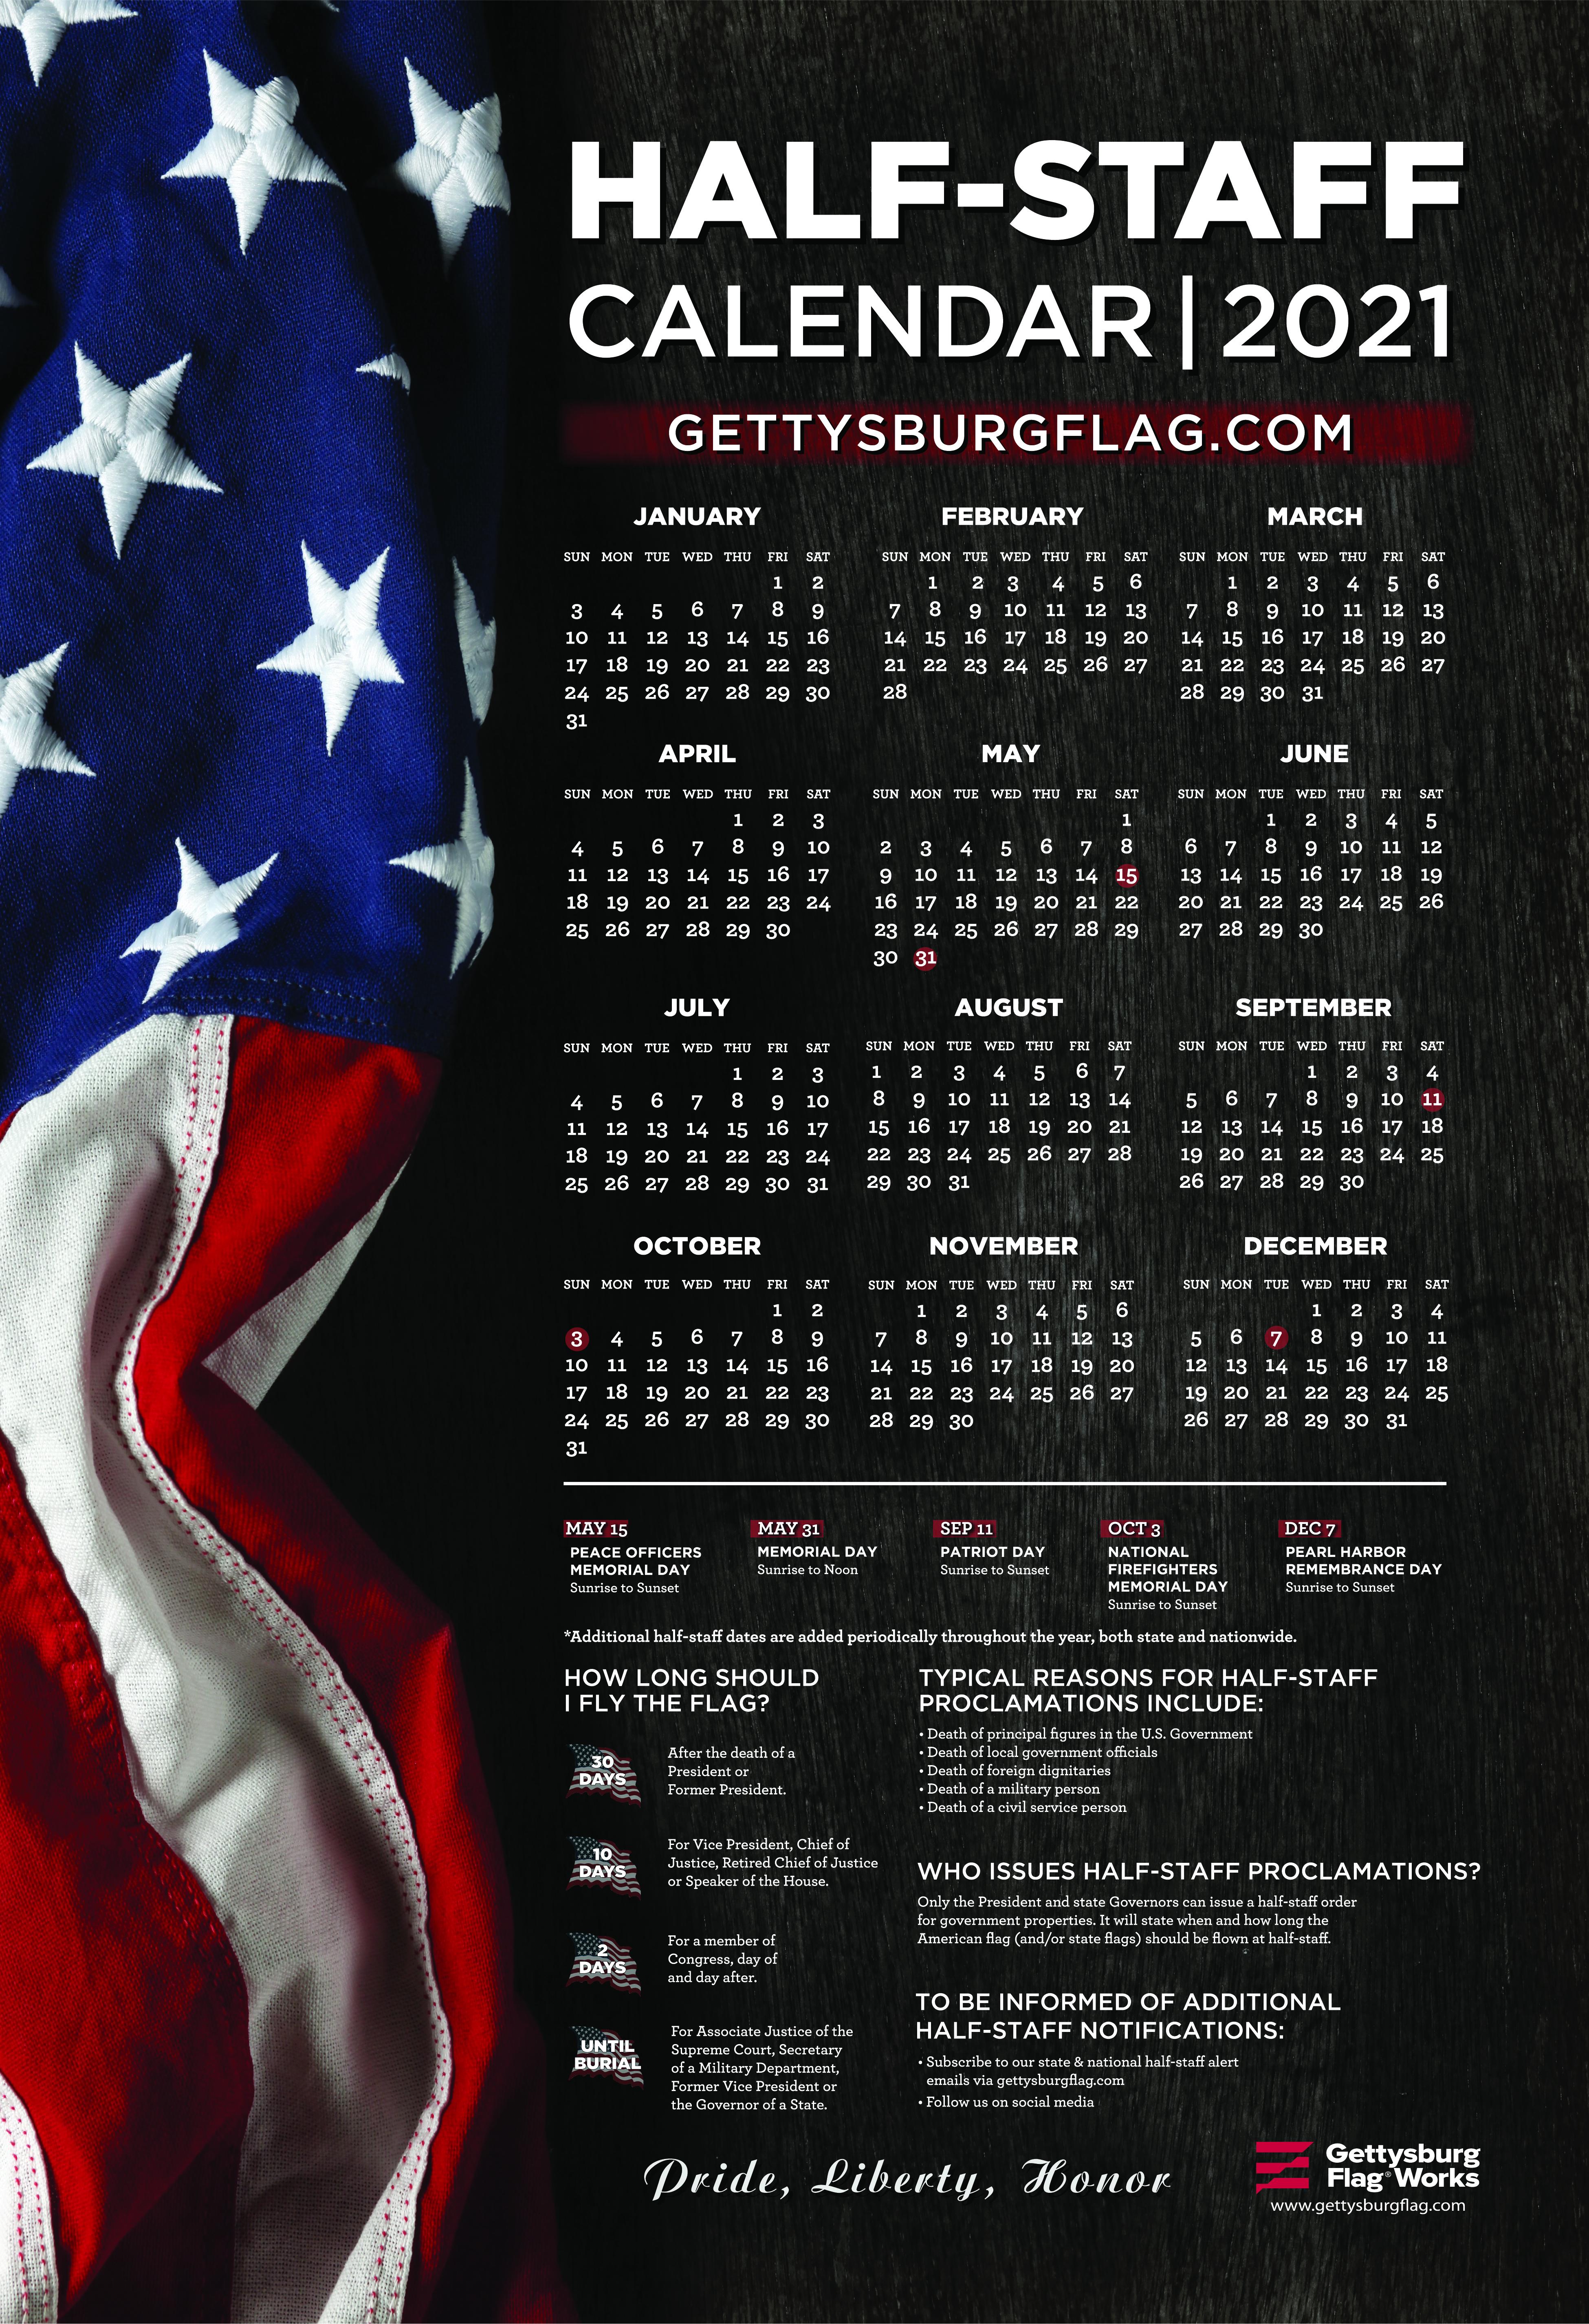 2021 Half-Staff Calendar